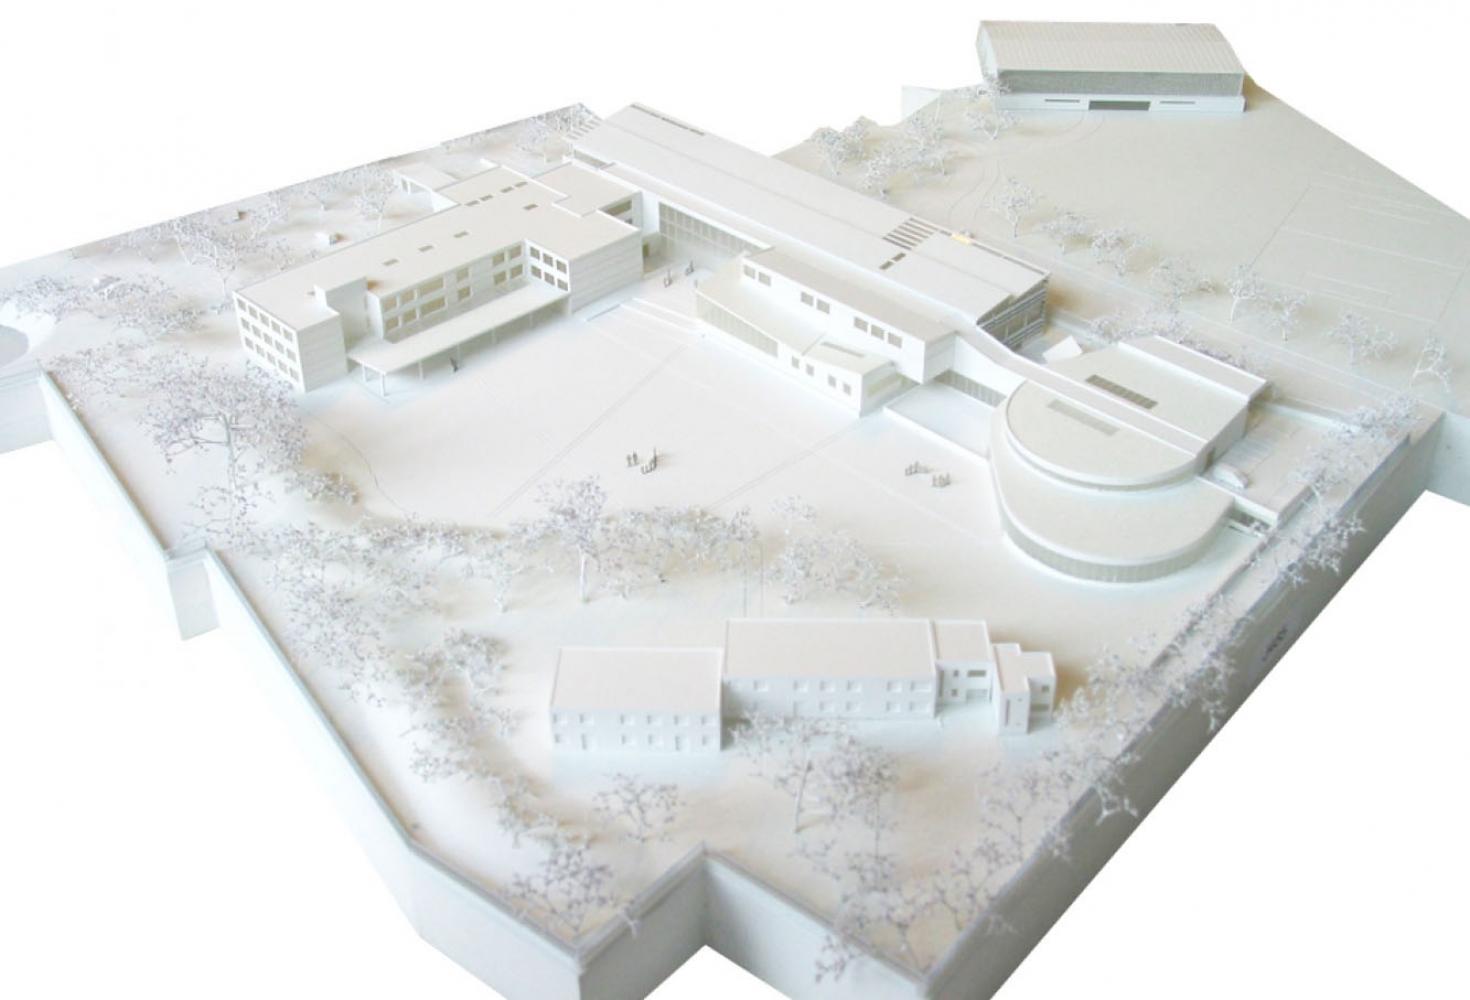 7-zarp--07 Pascale SEURIN Architecte - Enseignement